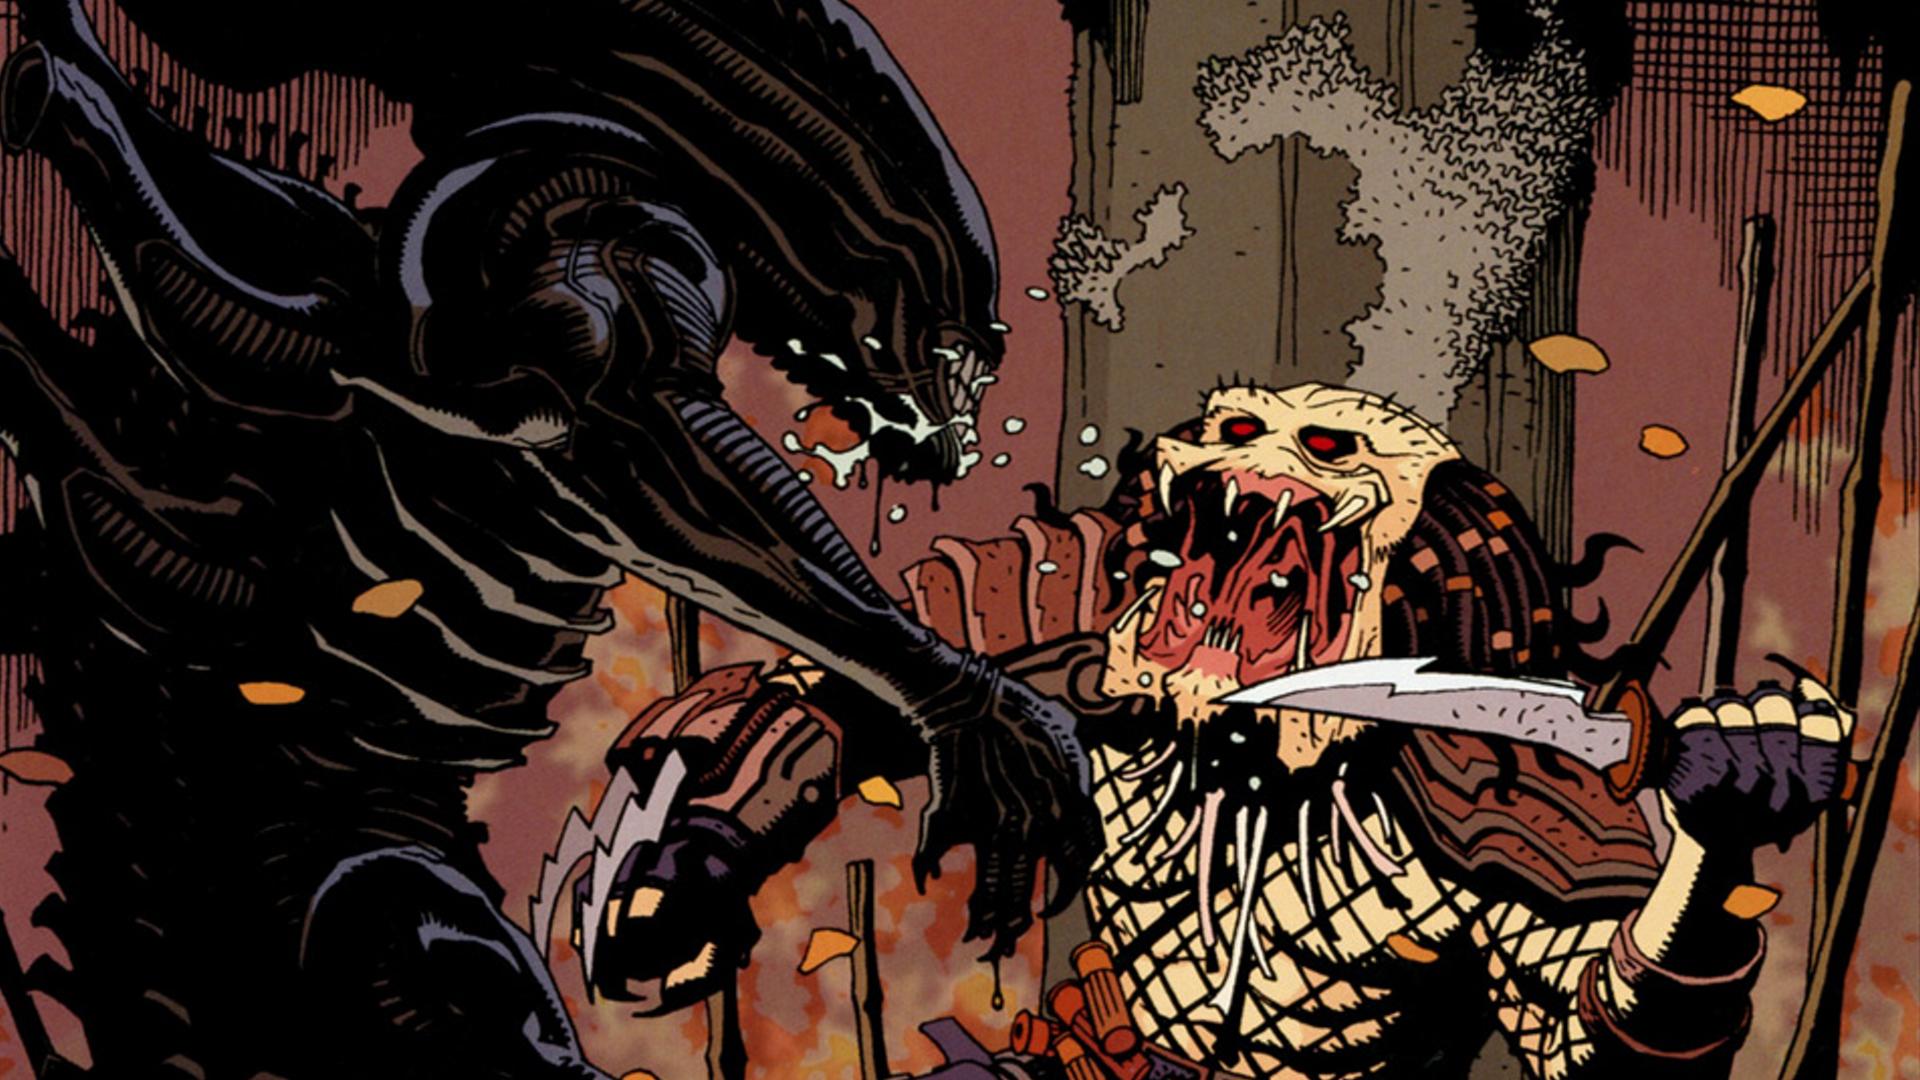 aliens vs. predator full hd wallpaper and background image